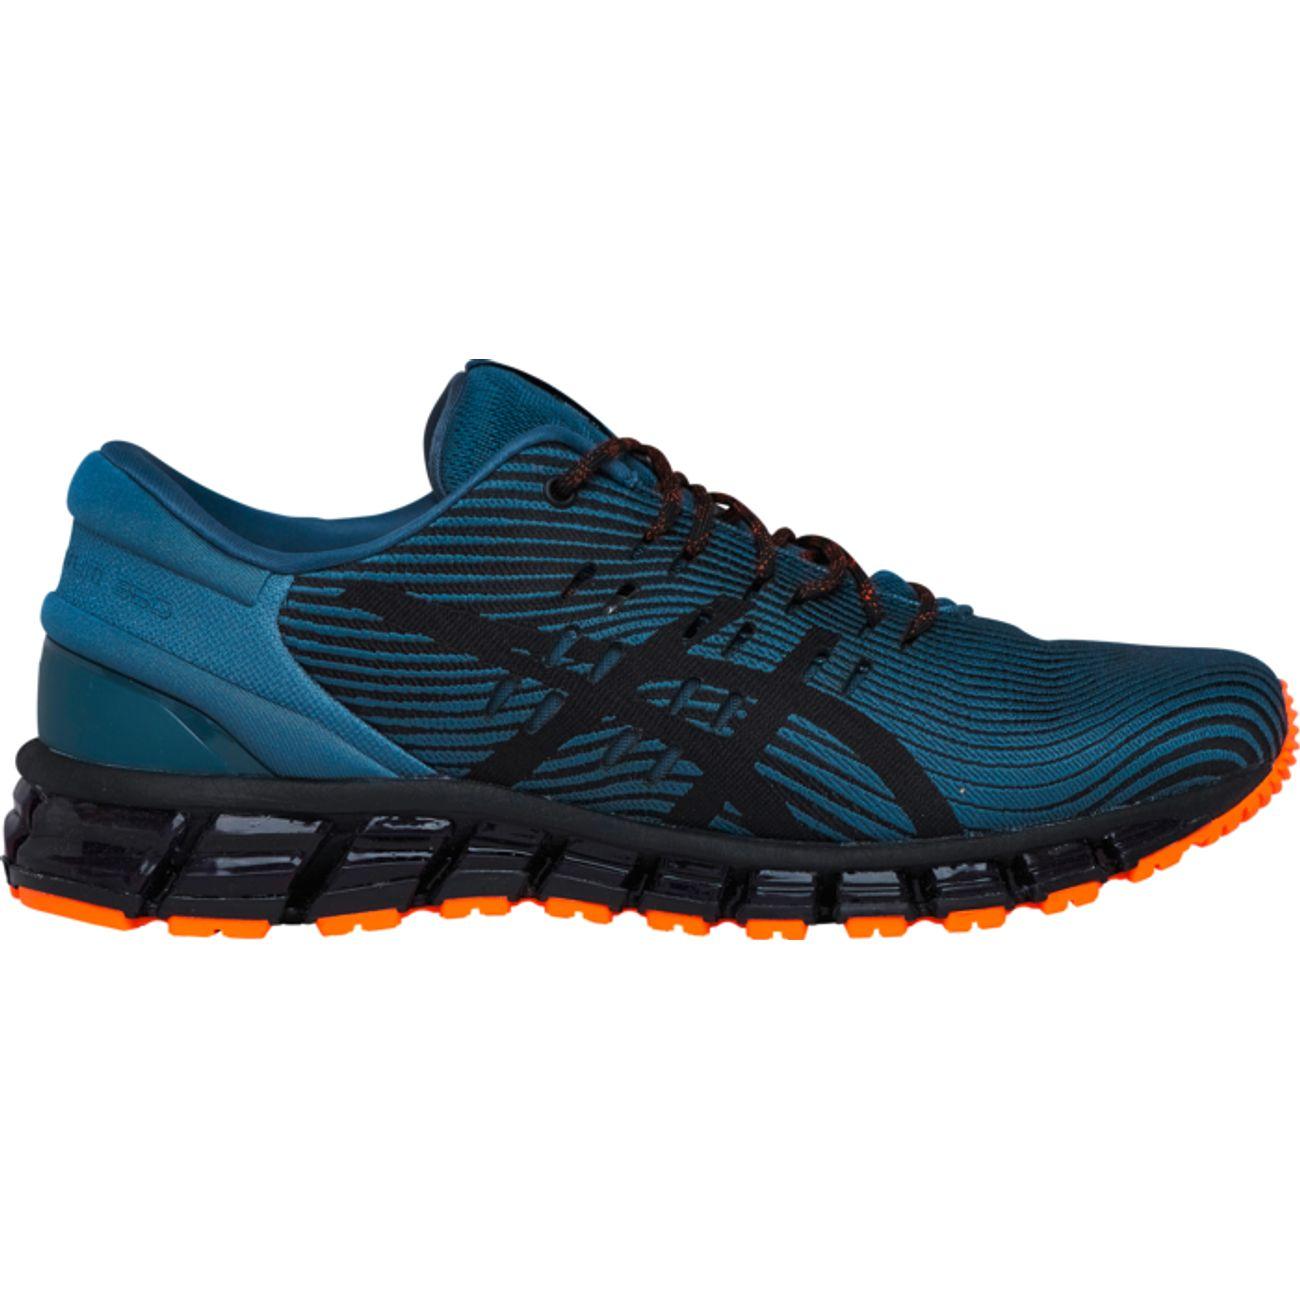 sports shoes ce620 de077 CHAUSSURES BASSES running homme ASICS GEL-QUANTUM 360 4 ...